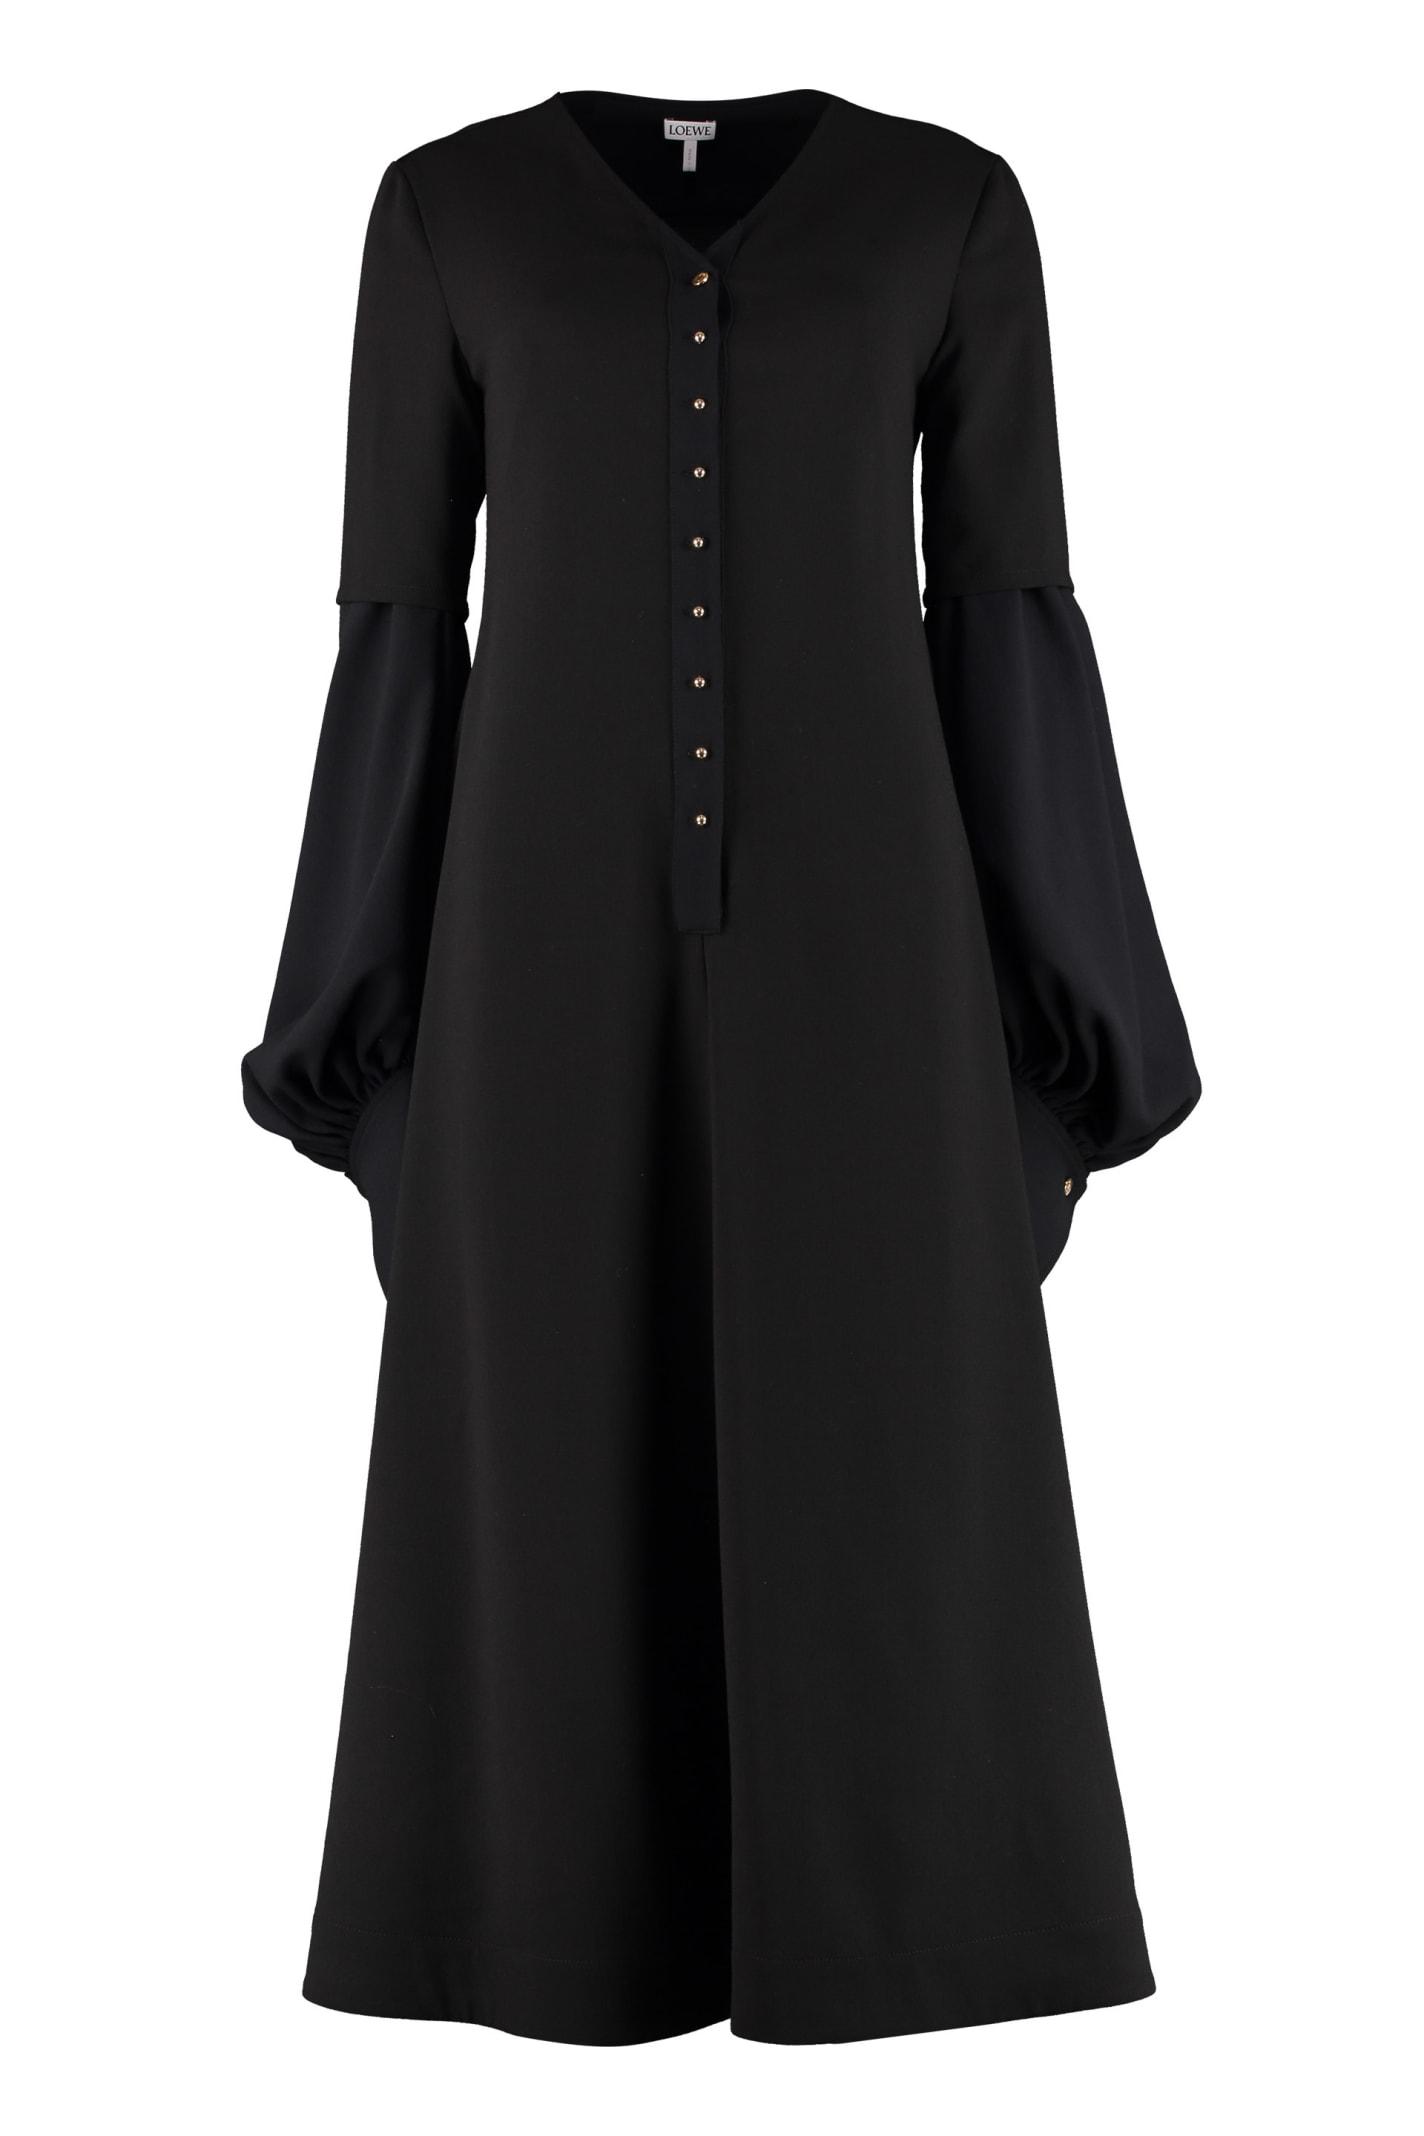 Buy Loewe Ruched Sleeves Dress online, shop Loewe with free shipping